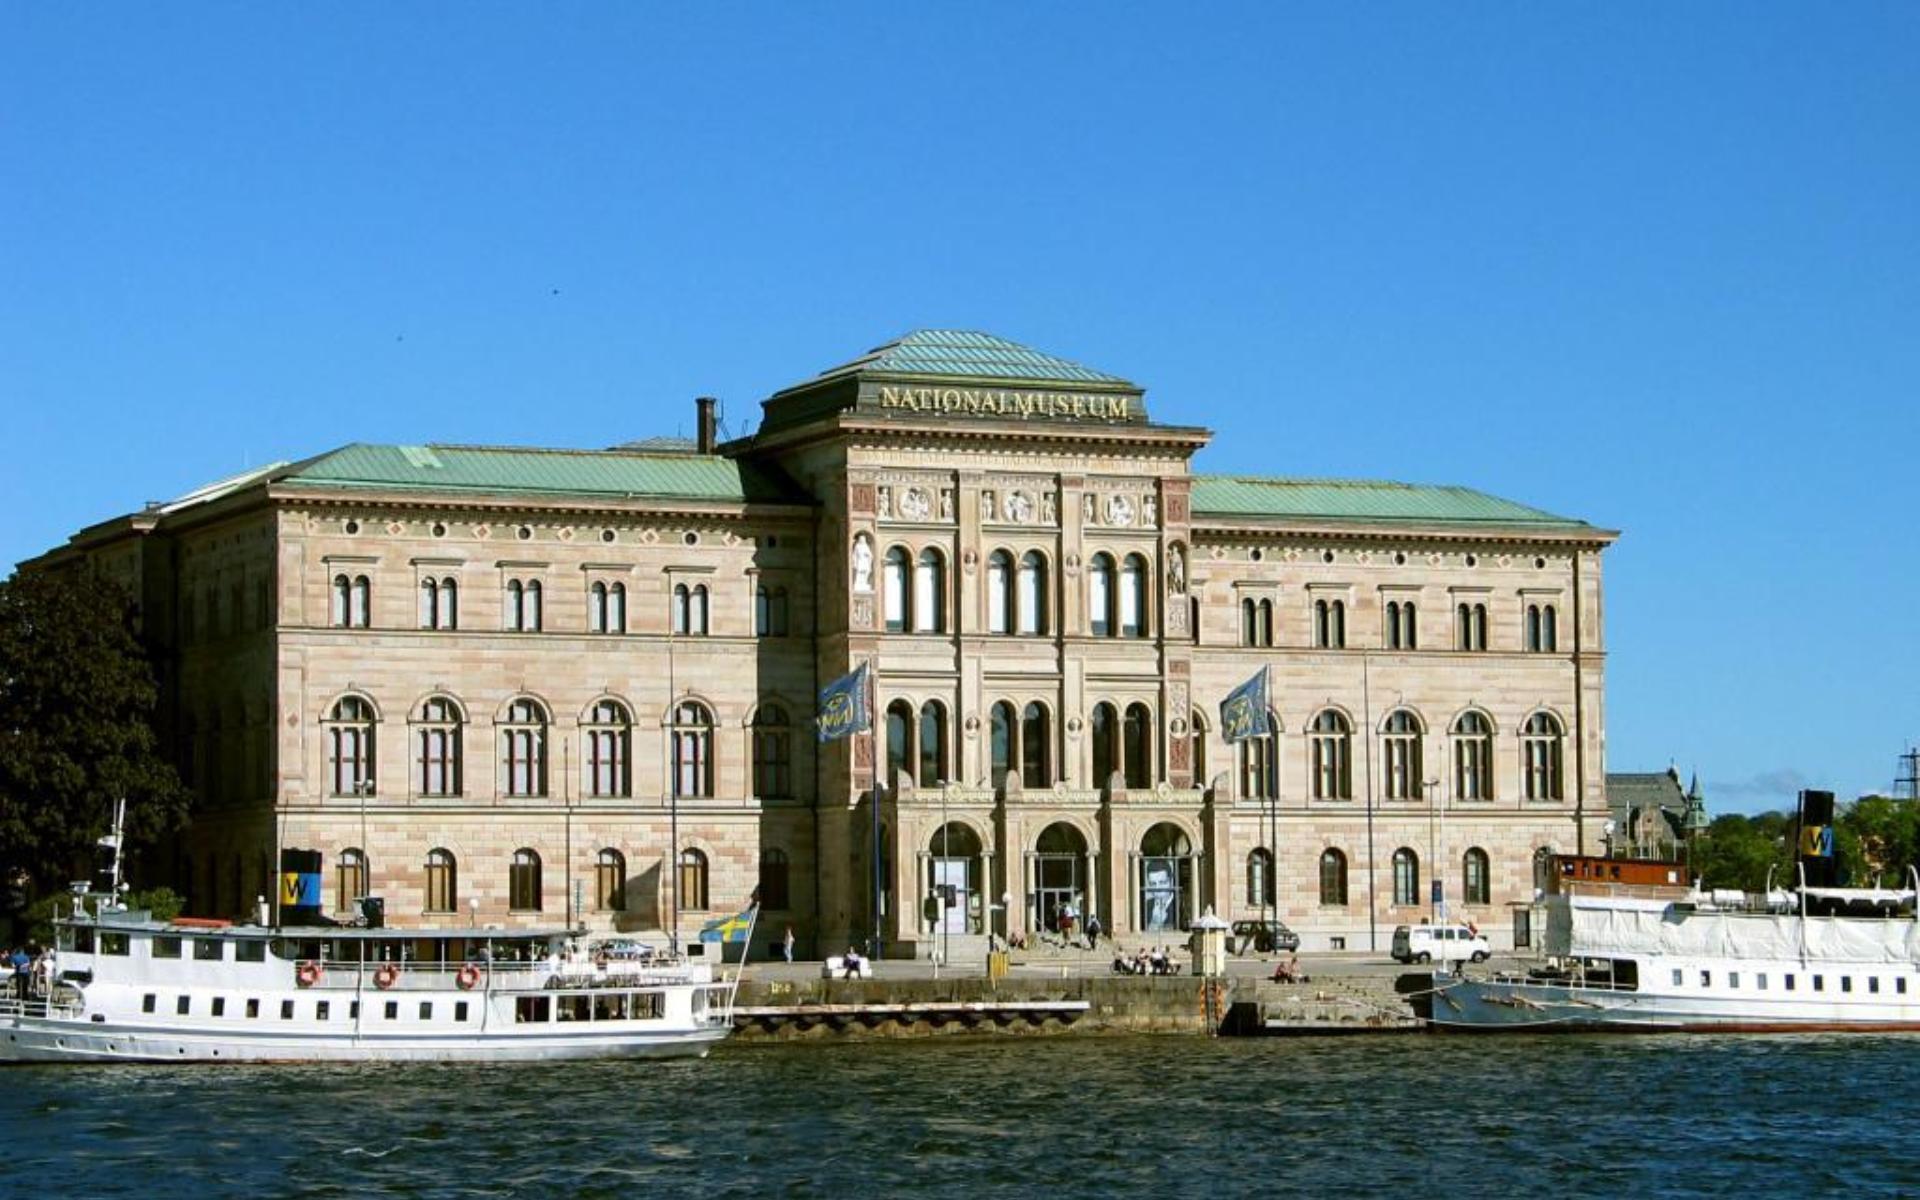 Картинка Национальный музей Швеции ...: www.kartinki24.ru/kartinki/muzei/20364.html